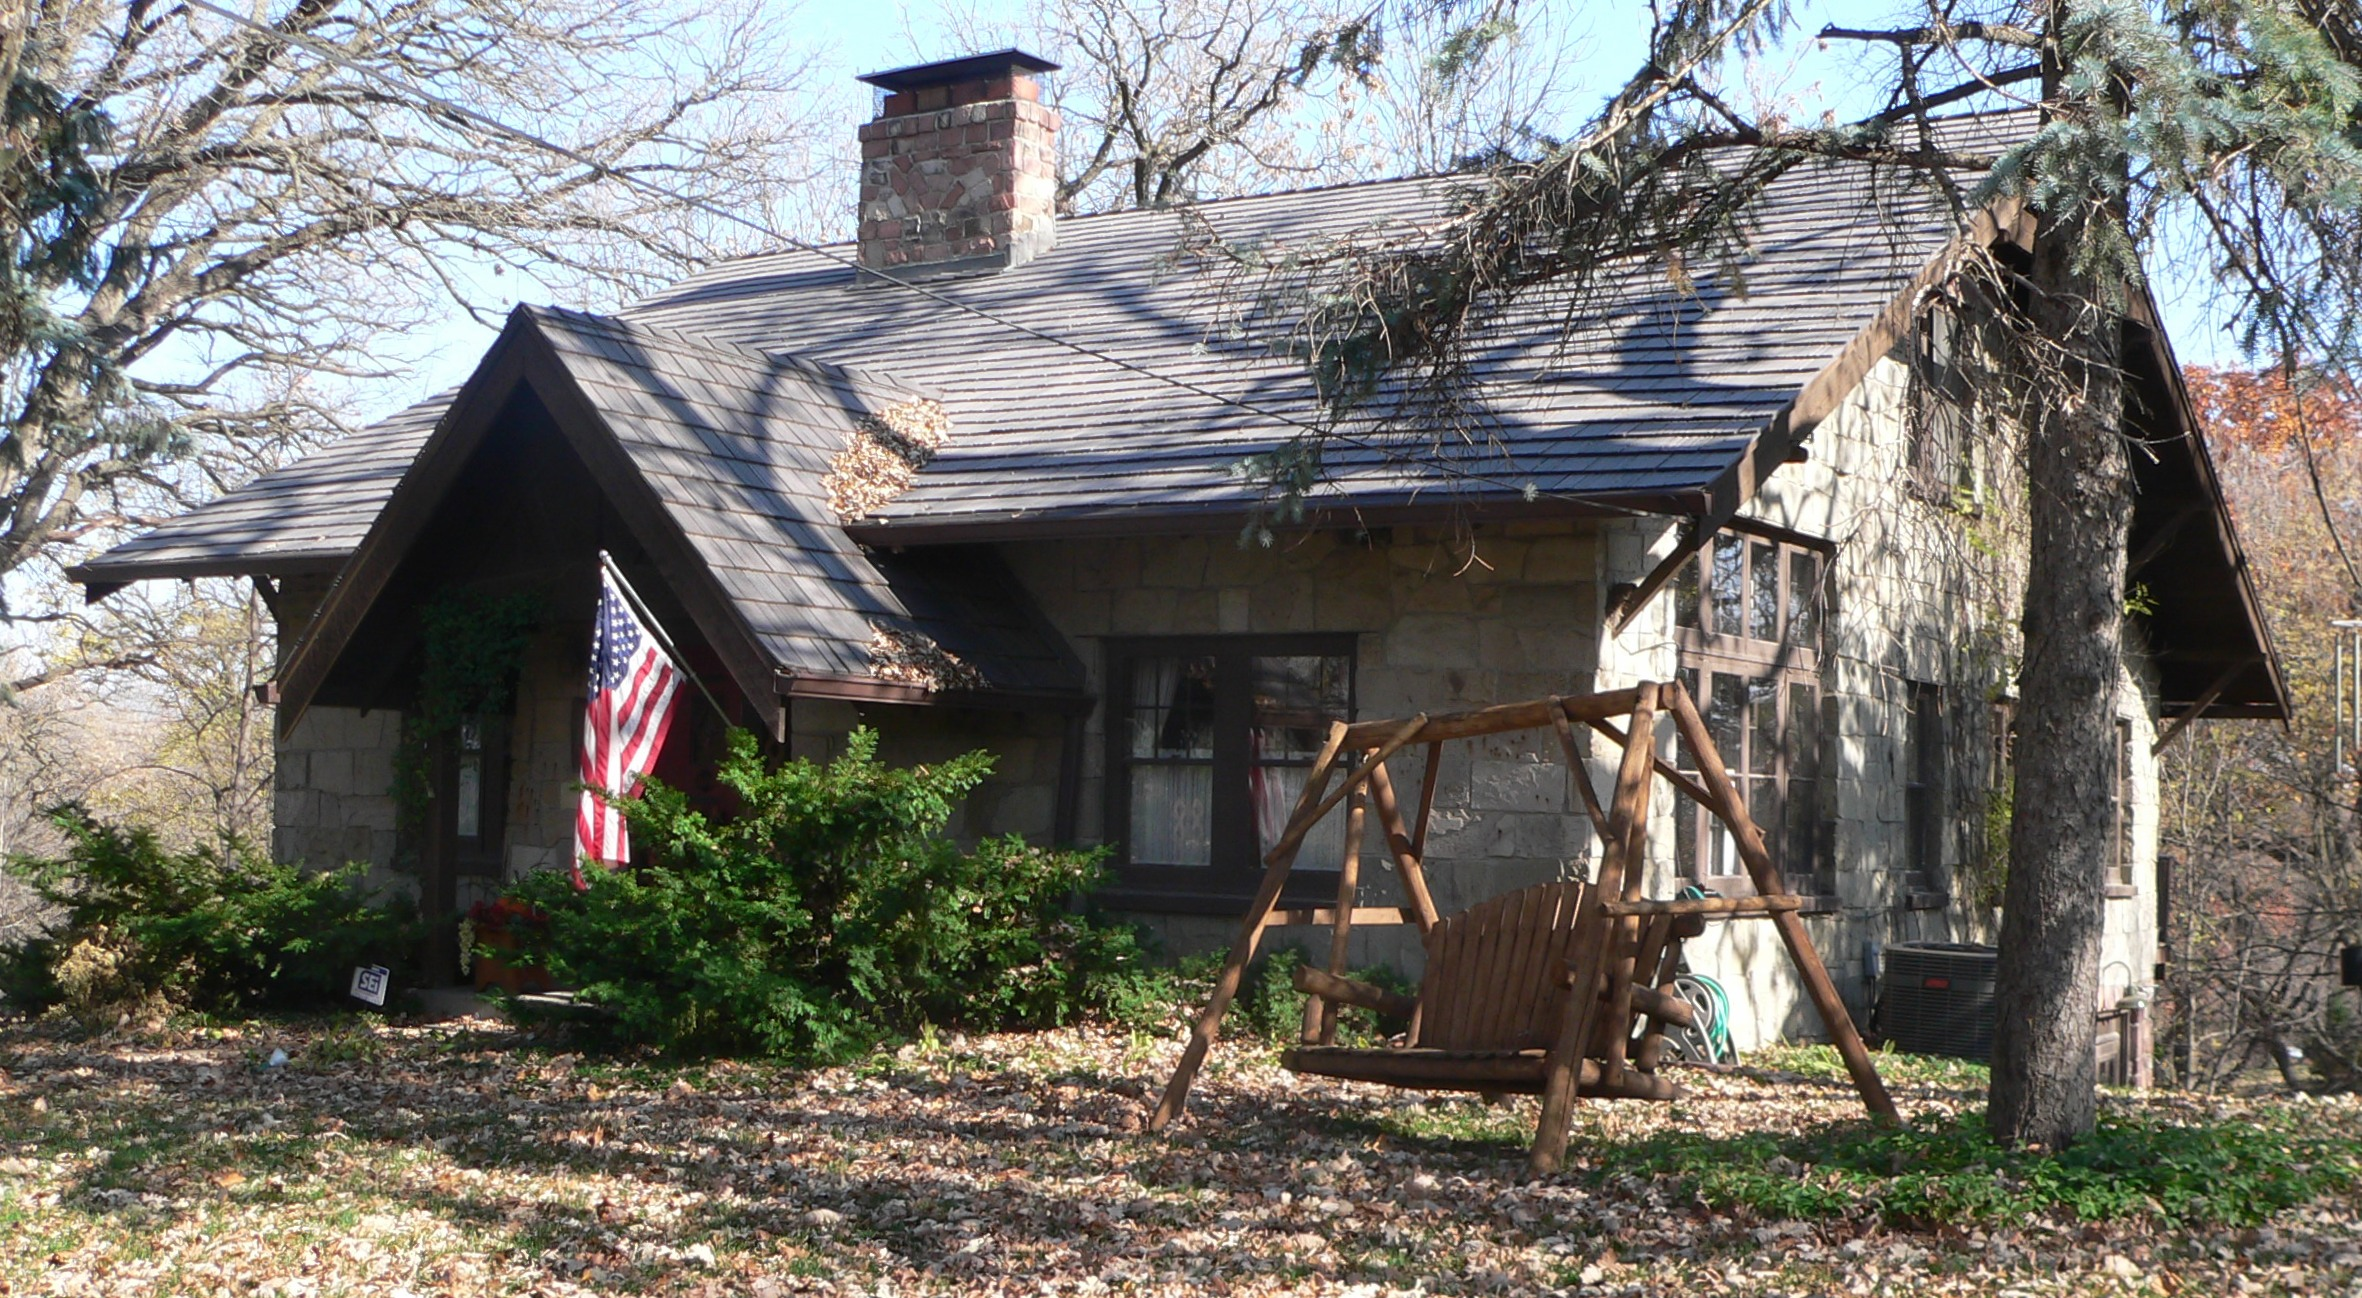 Datei:William E Gordon house (Bellevue, NE) from SE 3.jpg – Wikipedia